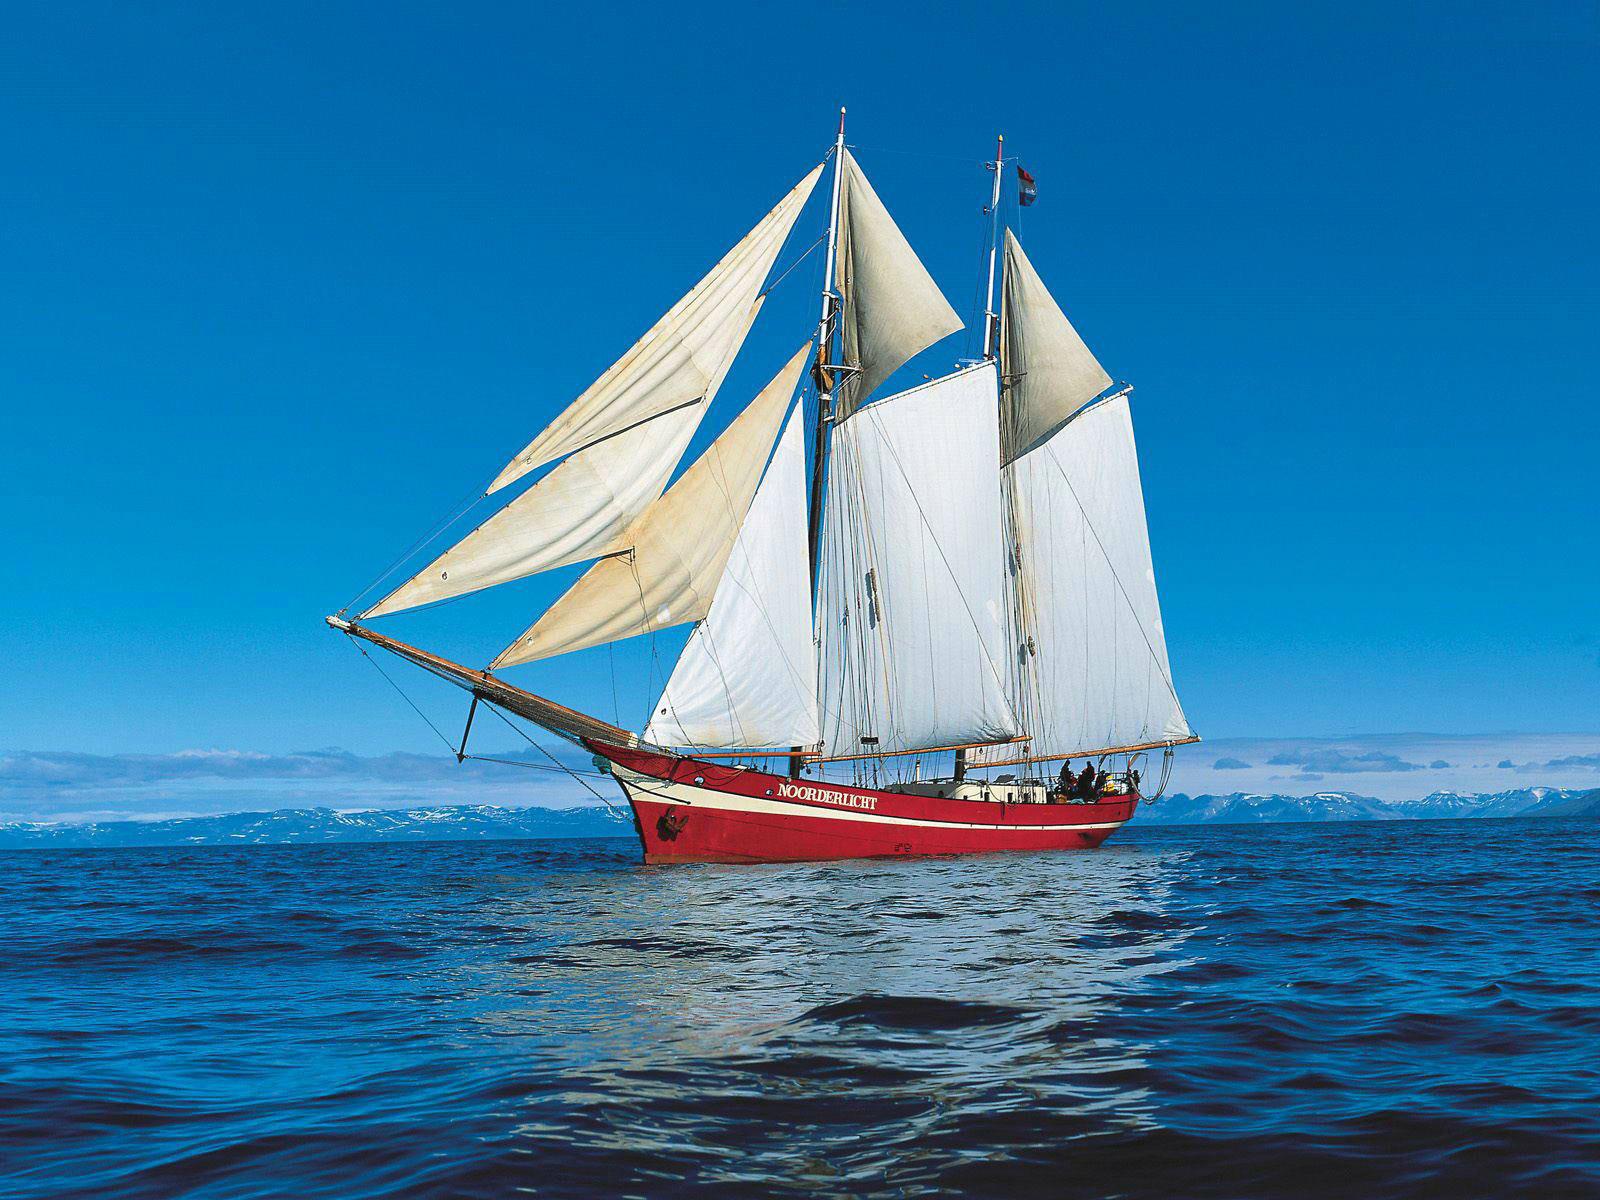 Desktop wallpaper downloads Ships Ship   Huge collection of 1600x1200